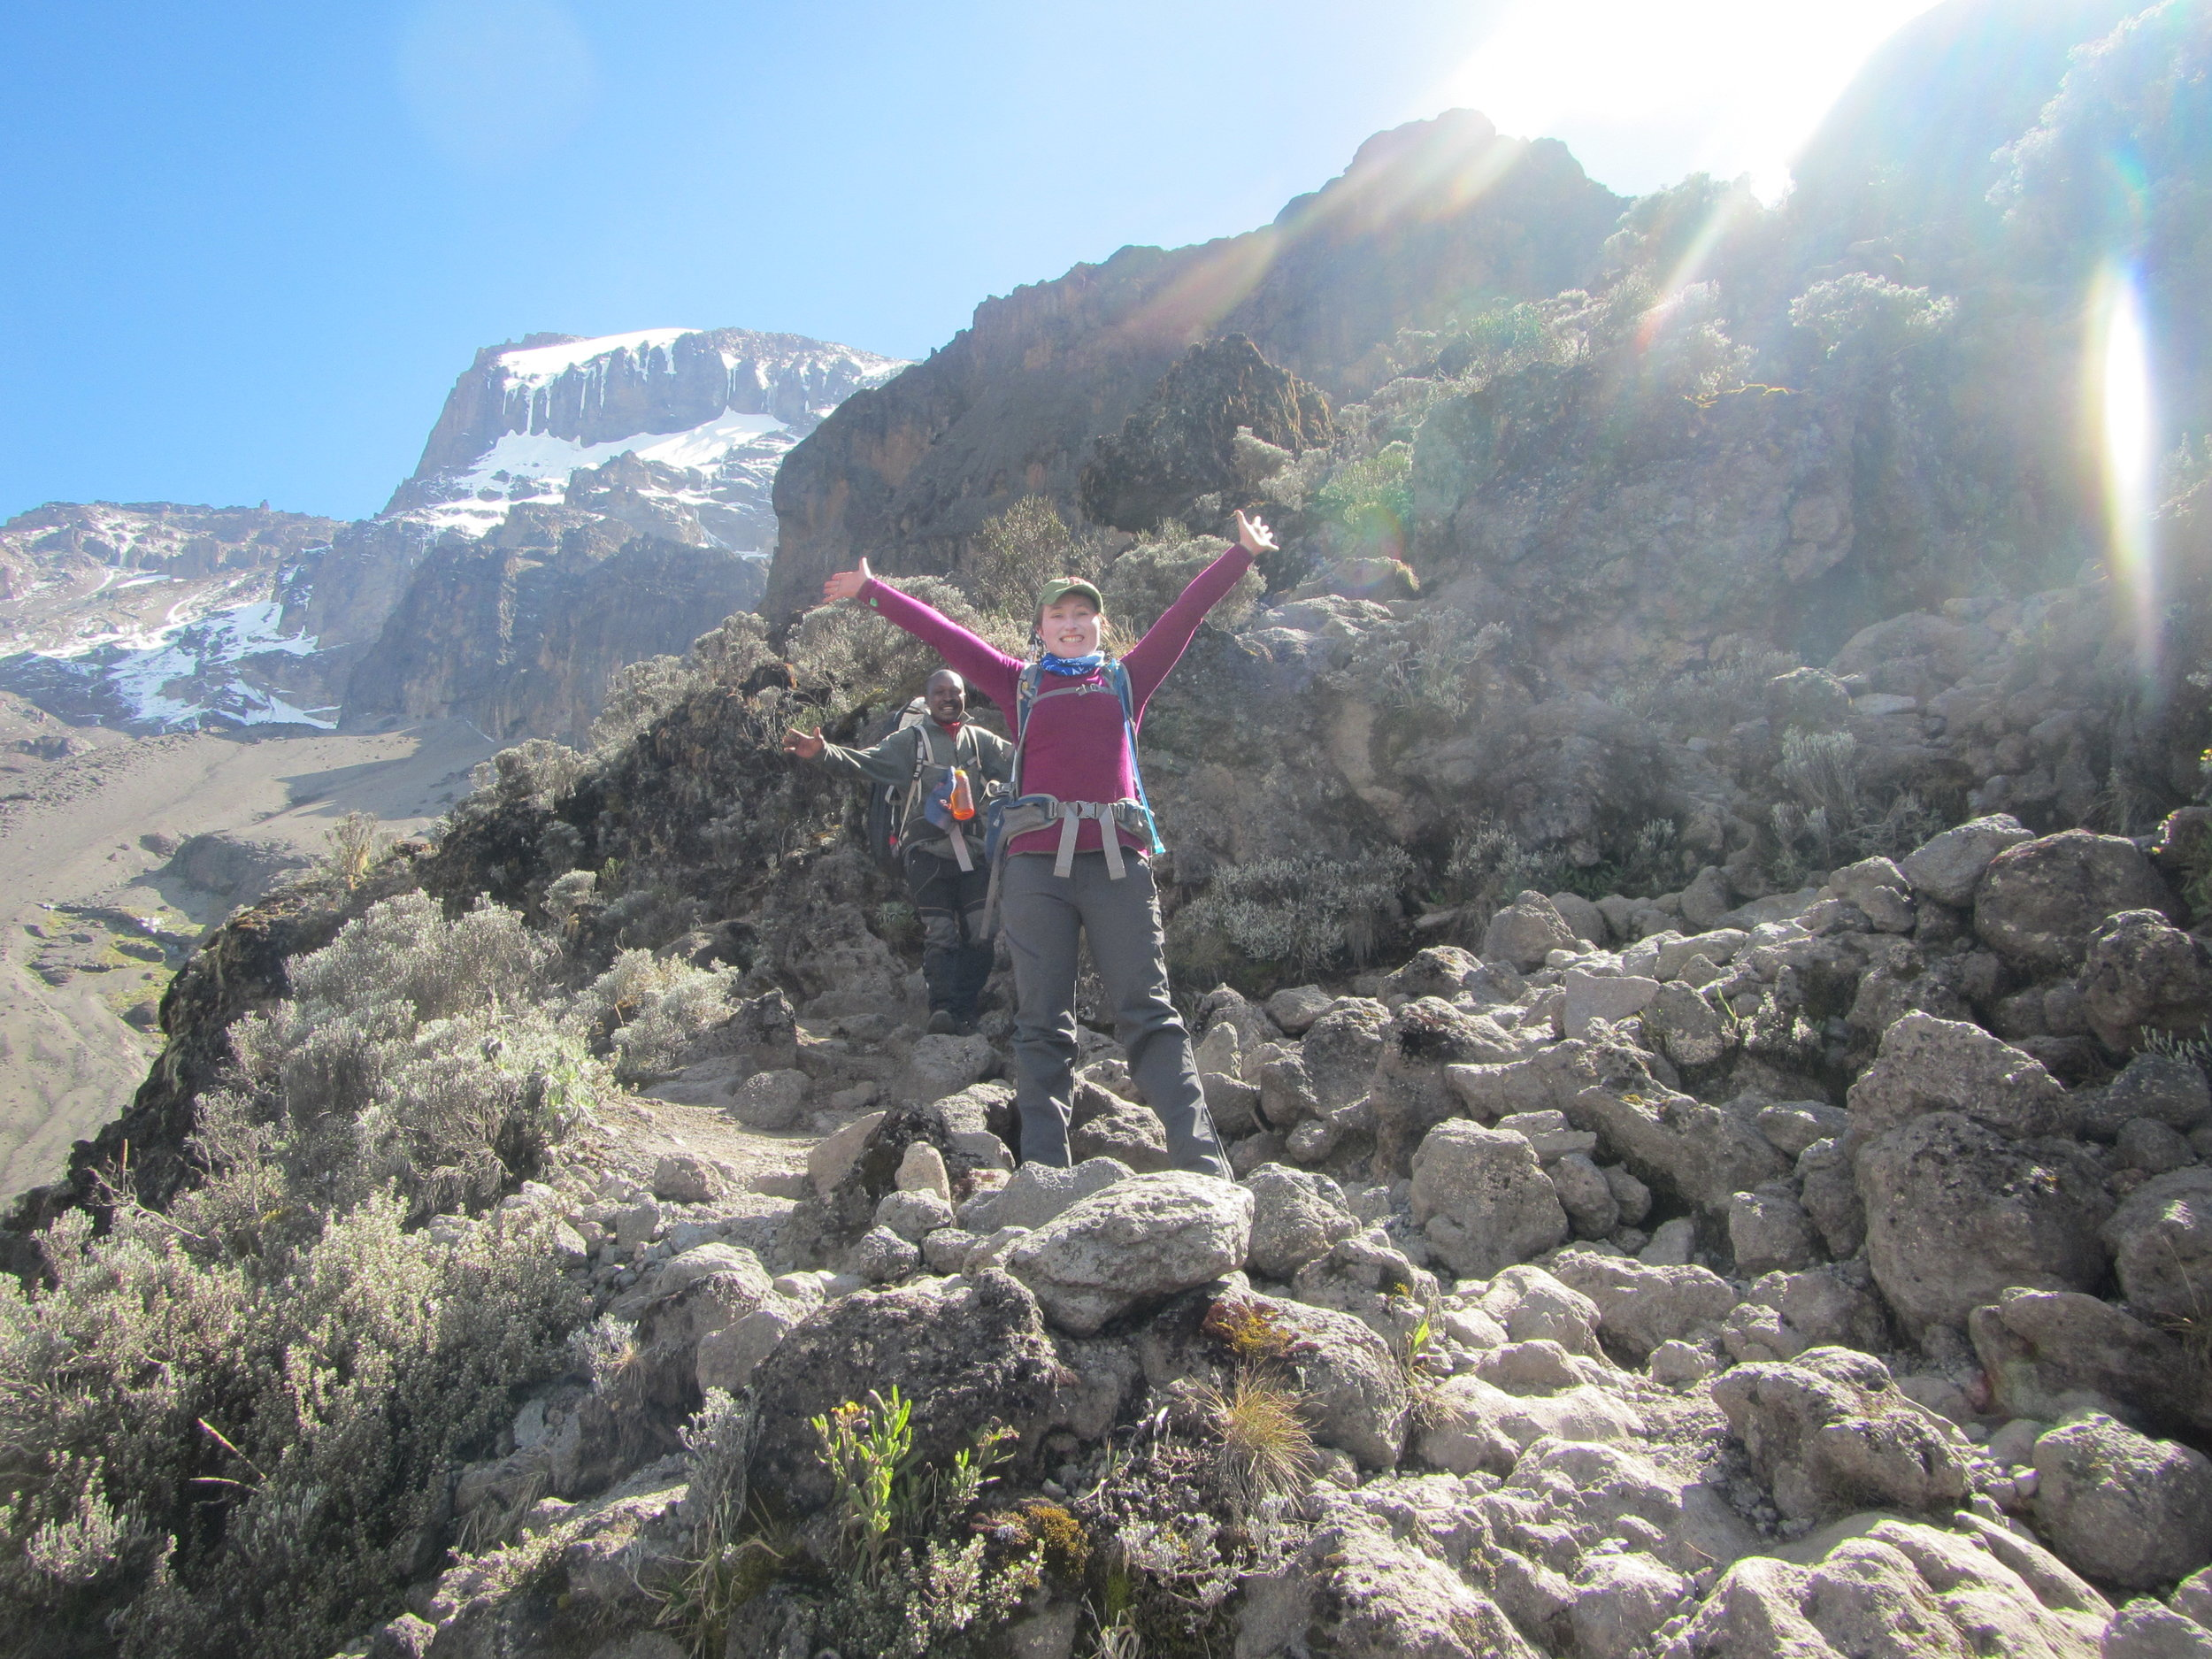 Tips for climbing Mount Kilimanjaro